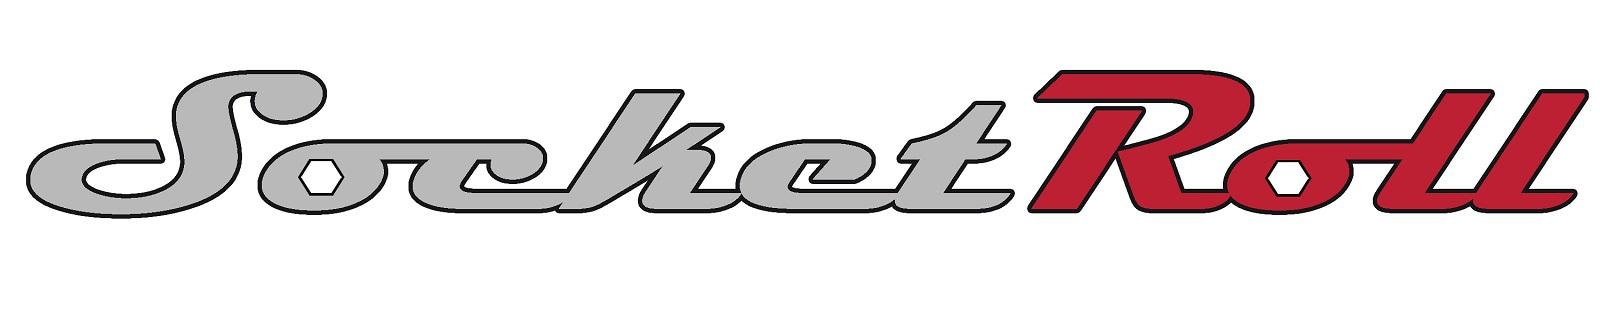 socket-roll-page.logo.1600px.jpg